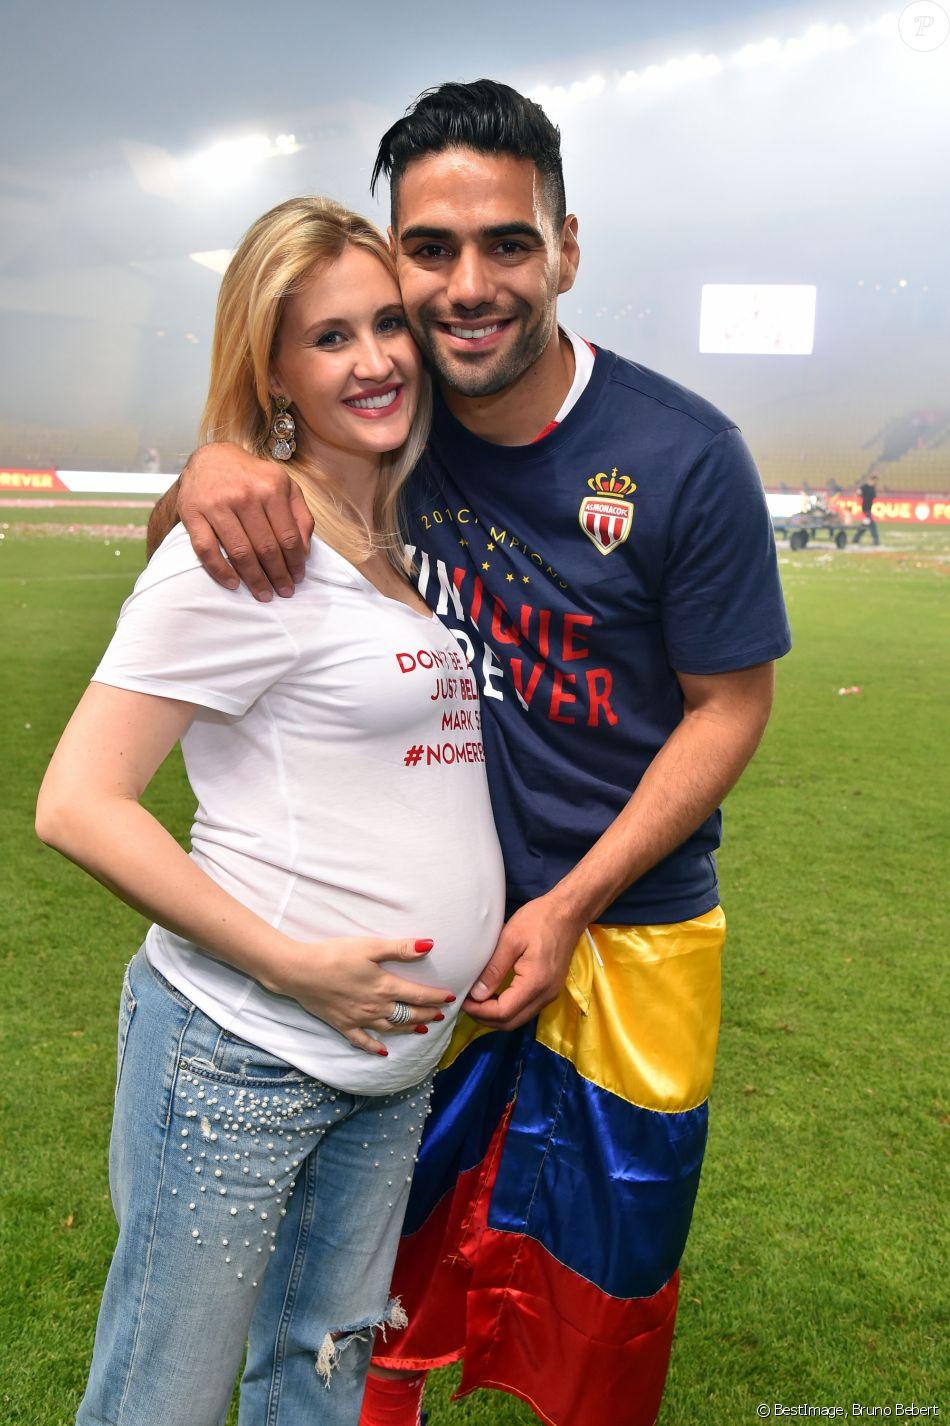 radamel falcao et sa femme lorelei taron enceinte durant la rencontre de football de ligue 1. Black Bedroom Furniture Sets. Home Design Ideas